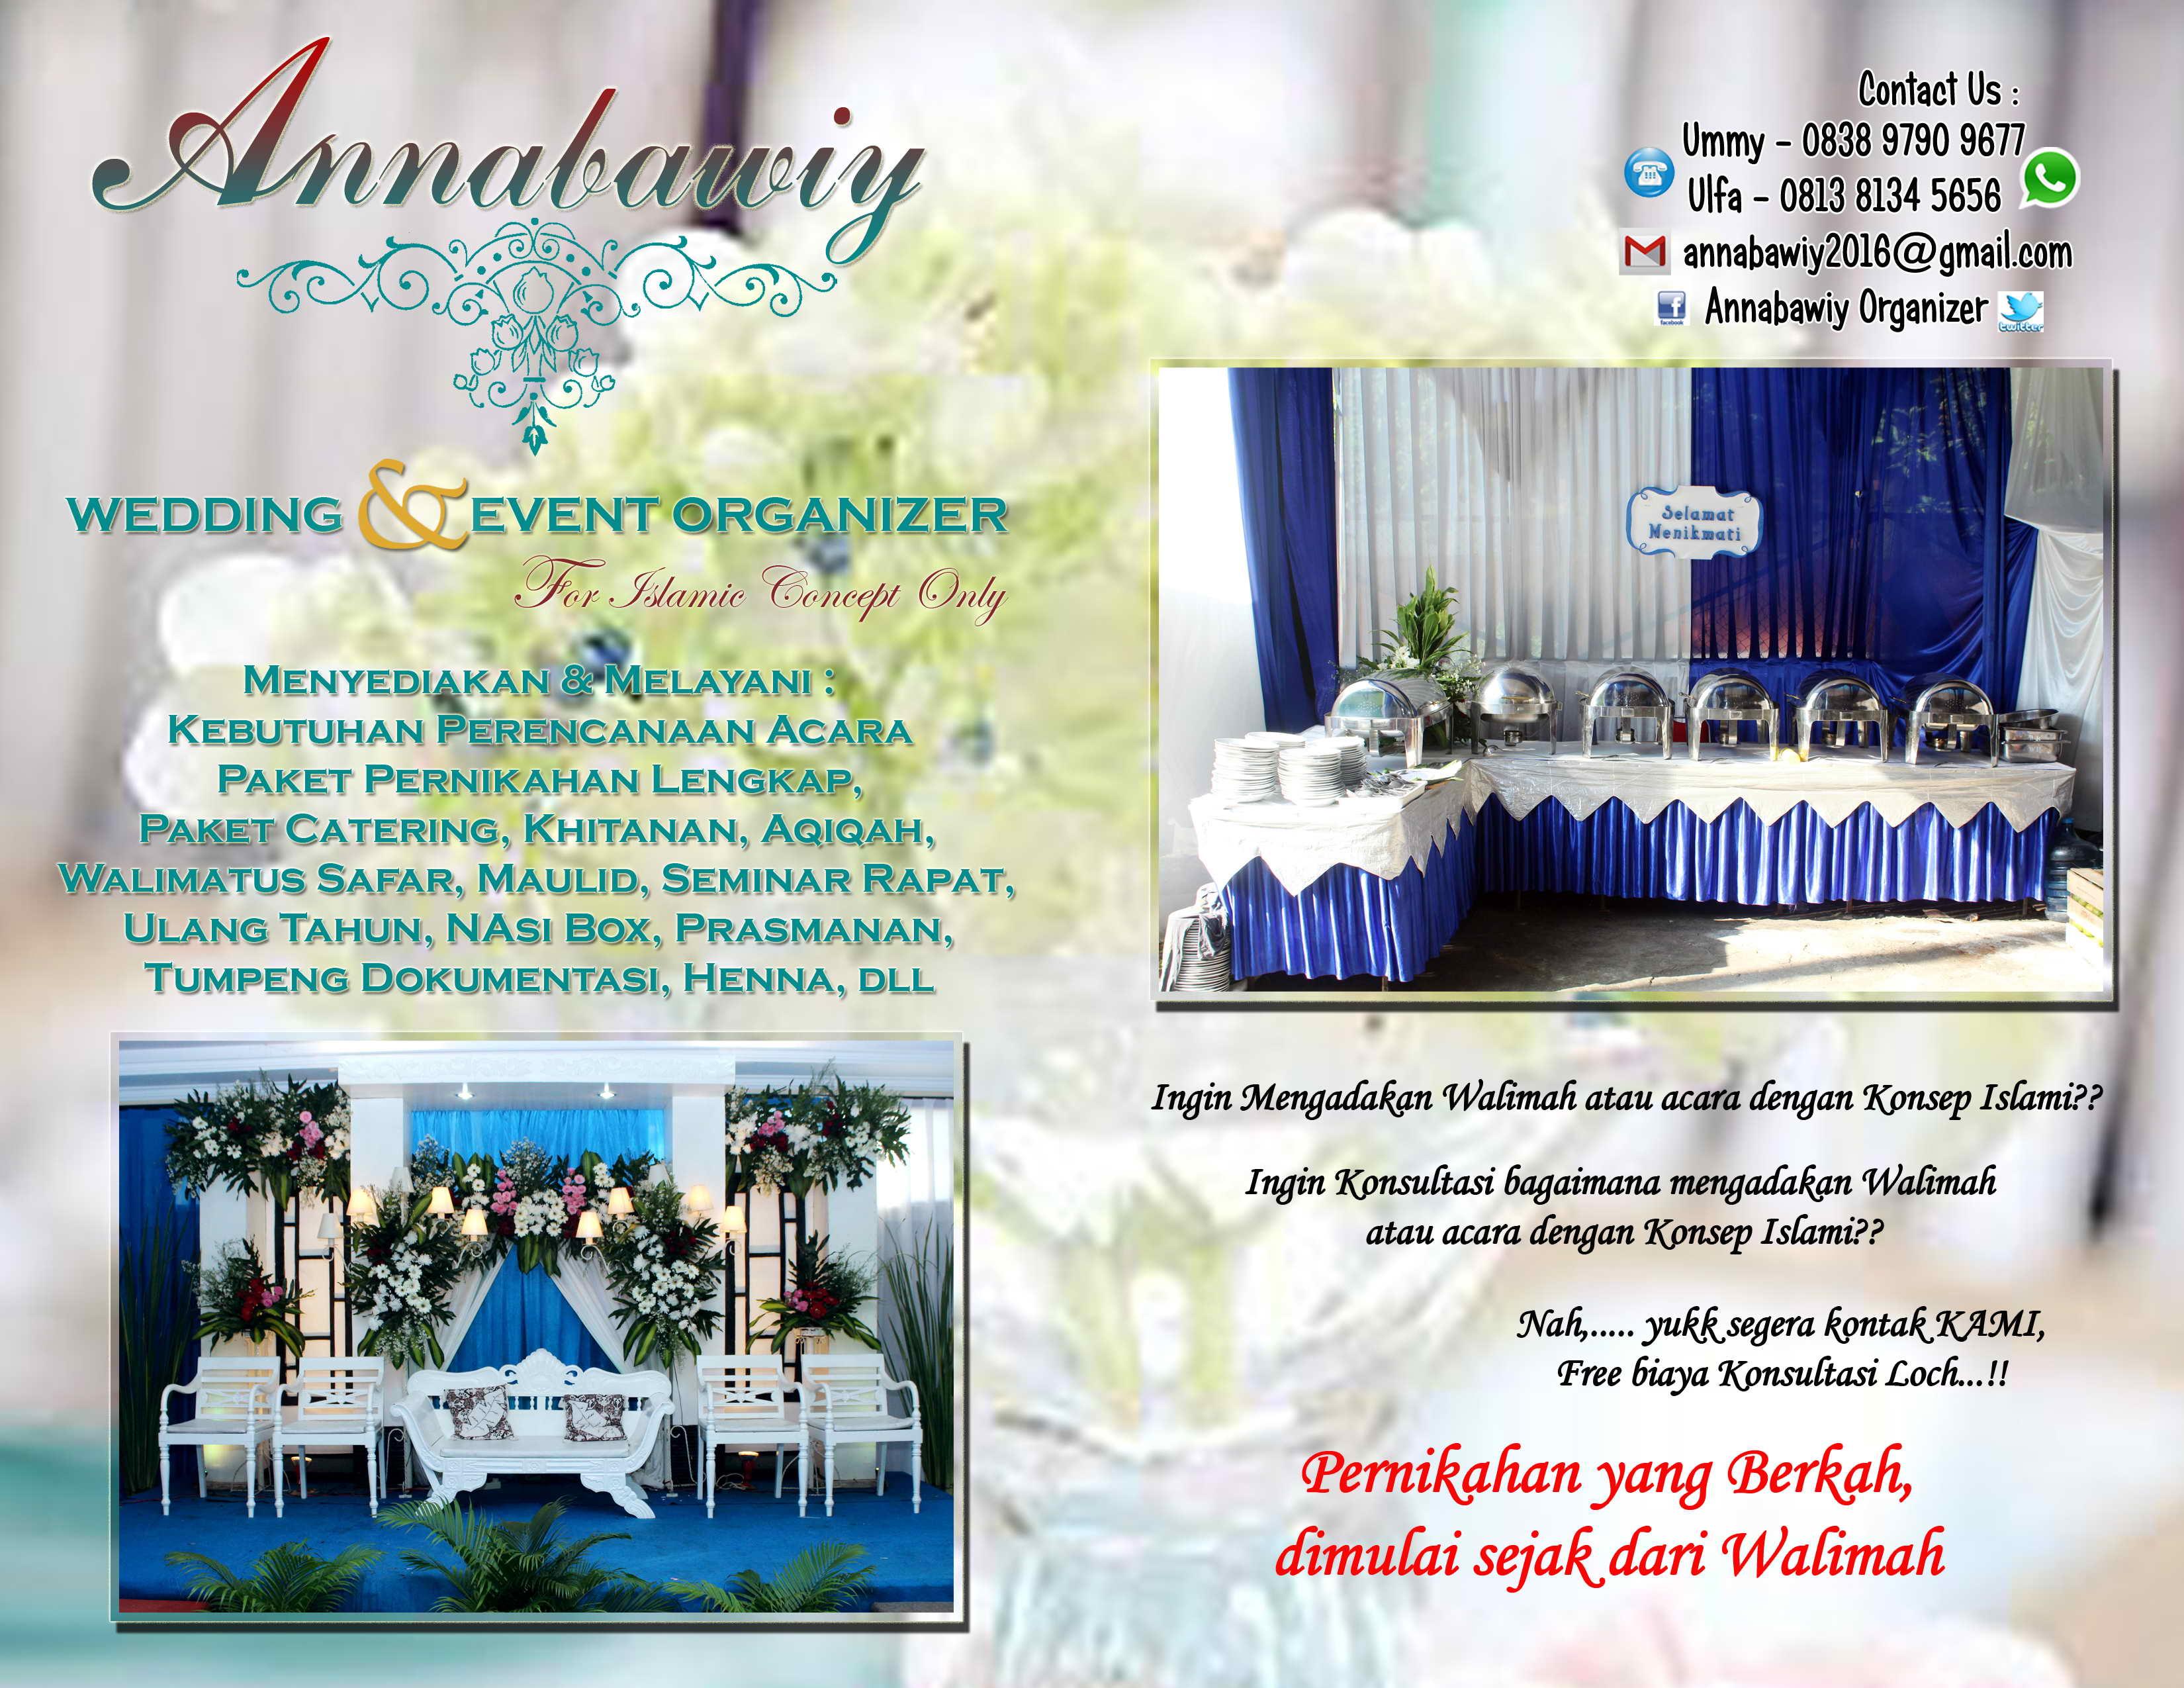 Contoh Flyer Event Organizer Materi Pelajaran 6